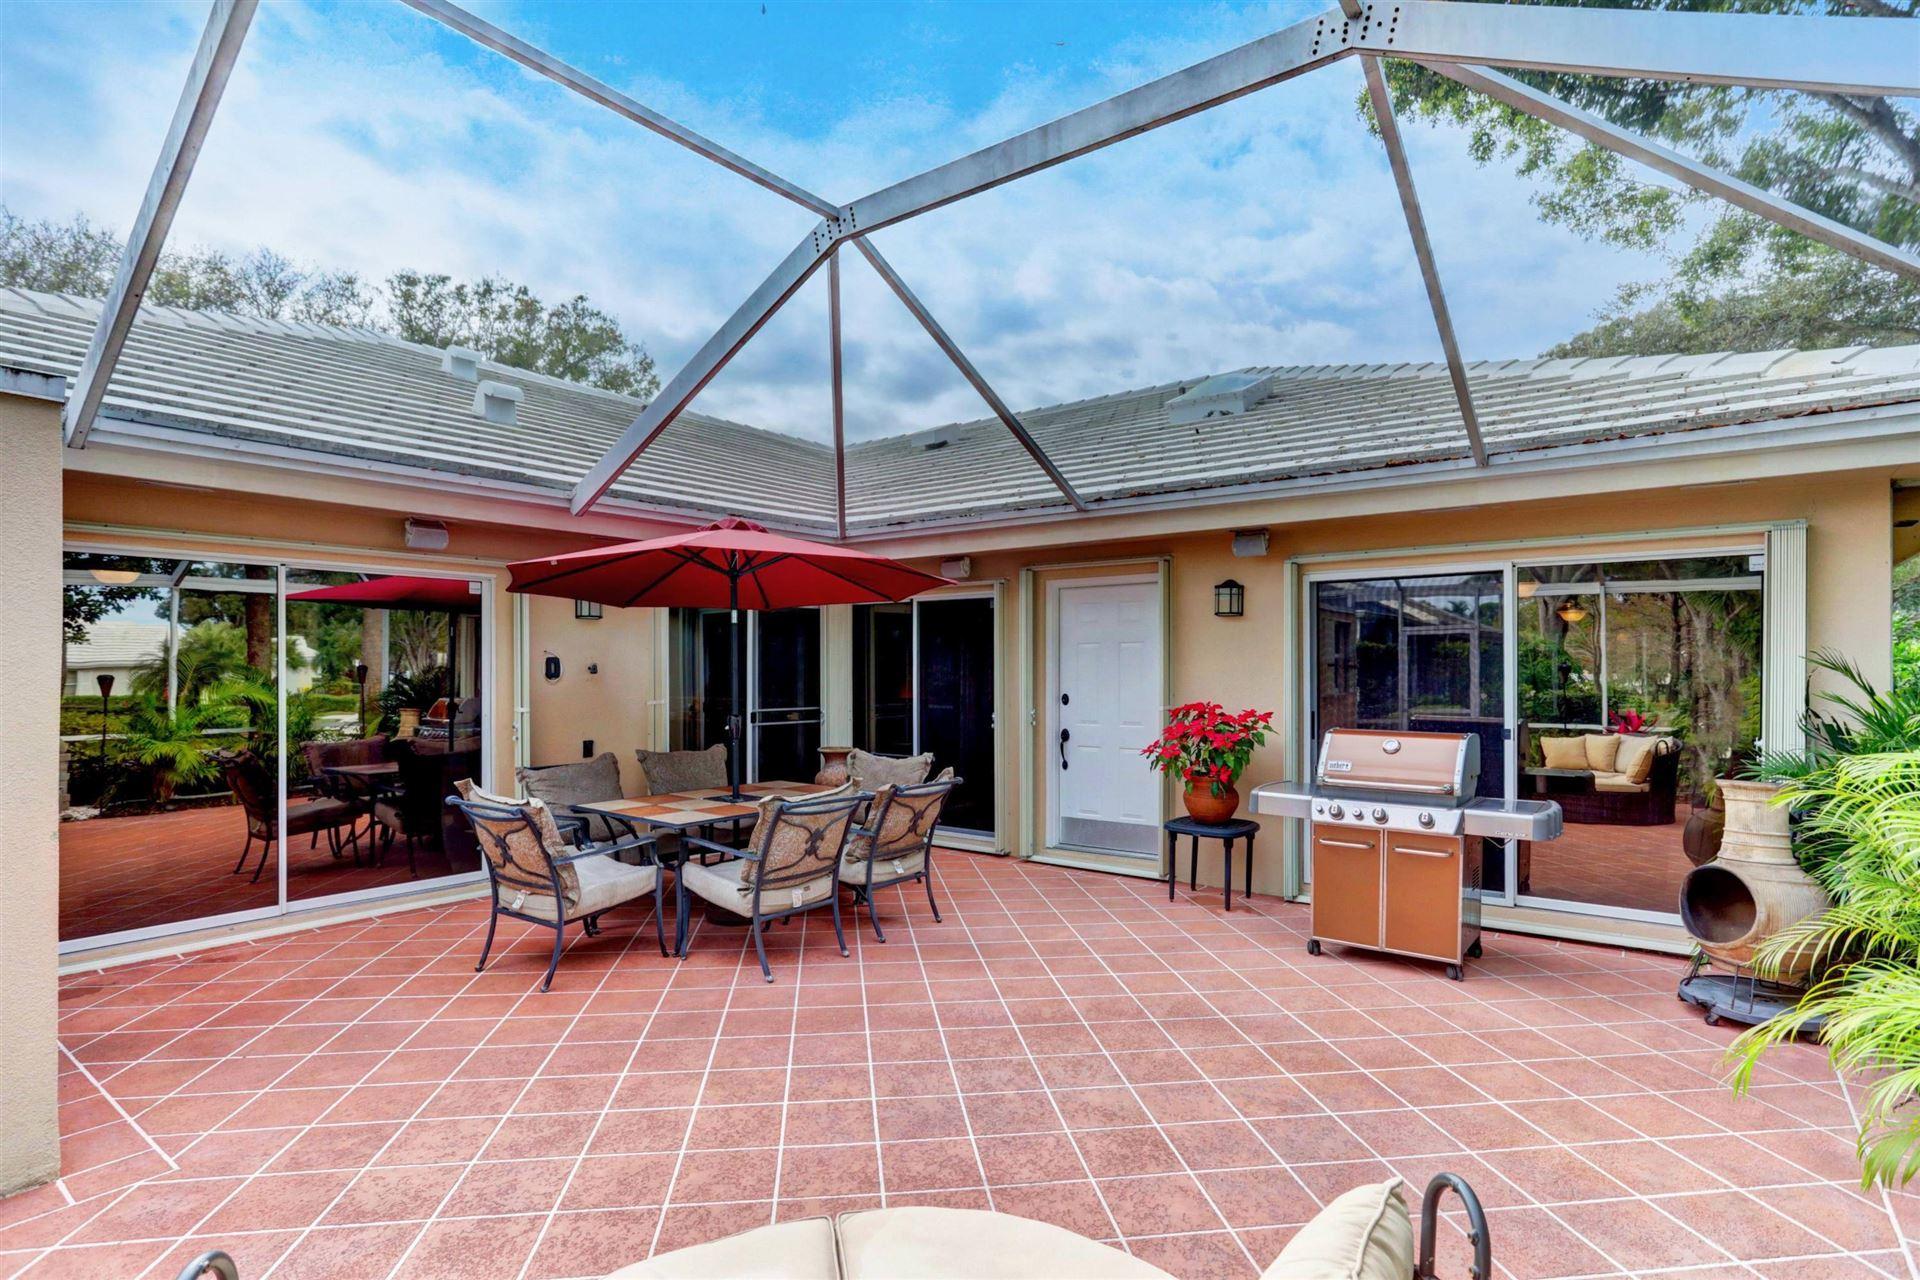 Photo of 3002 Lakemont Court #B, Palm Beach Gardens, FL 33403 (MLS # RX-10686818)